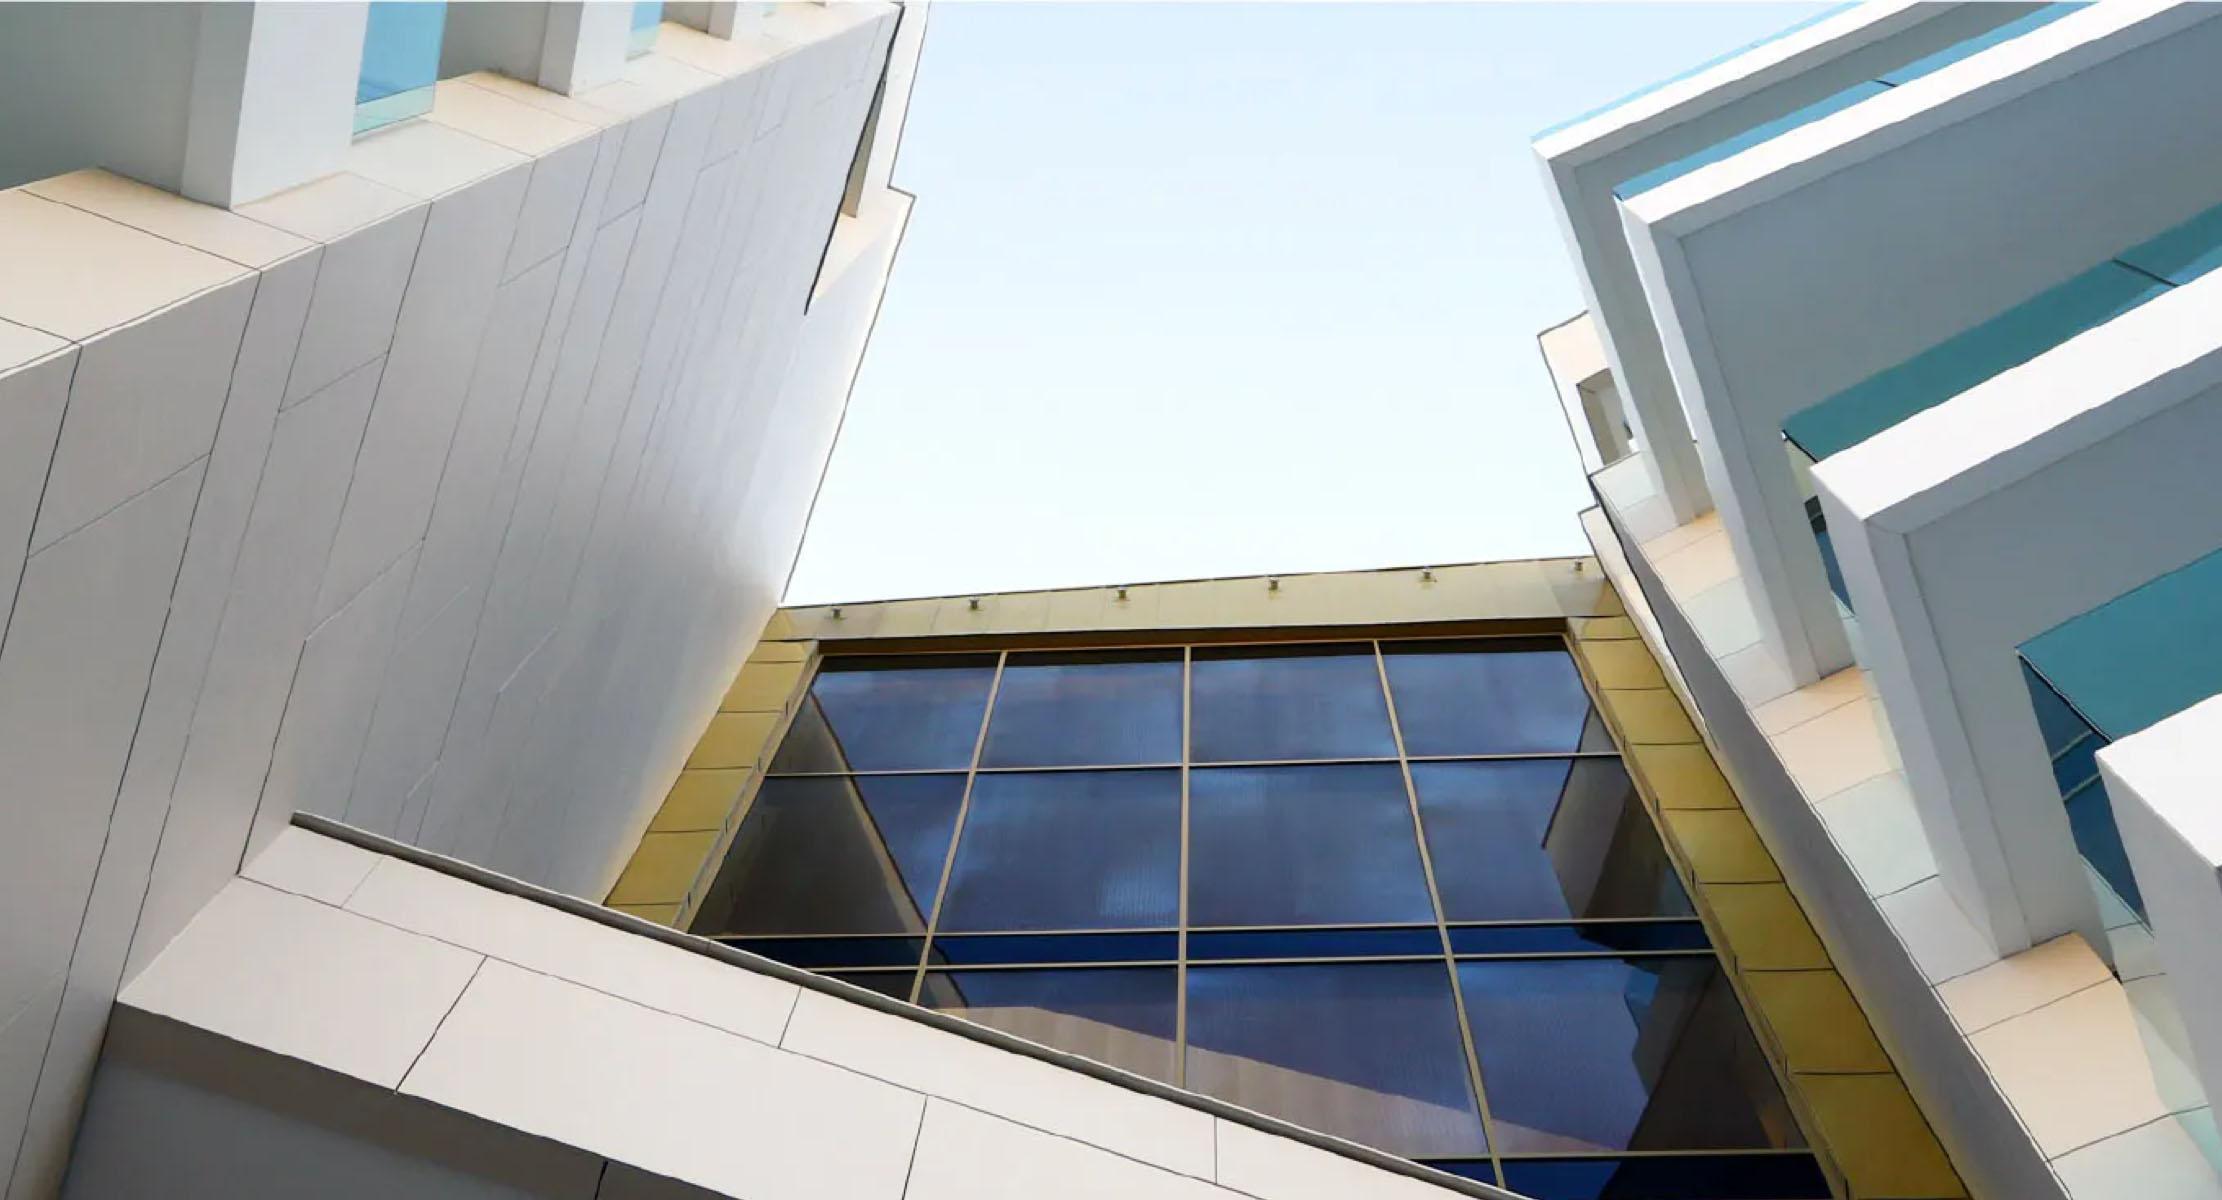 Image of header soluciones in Architecturale oplossingen - Cosentino